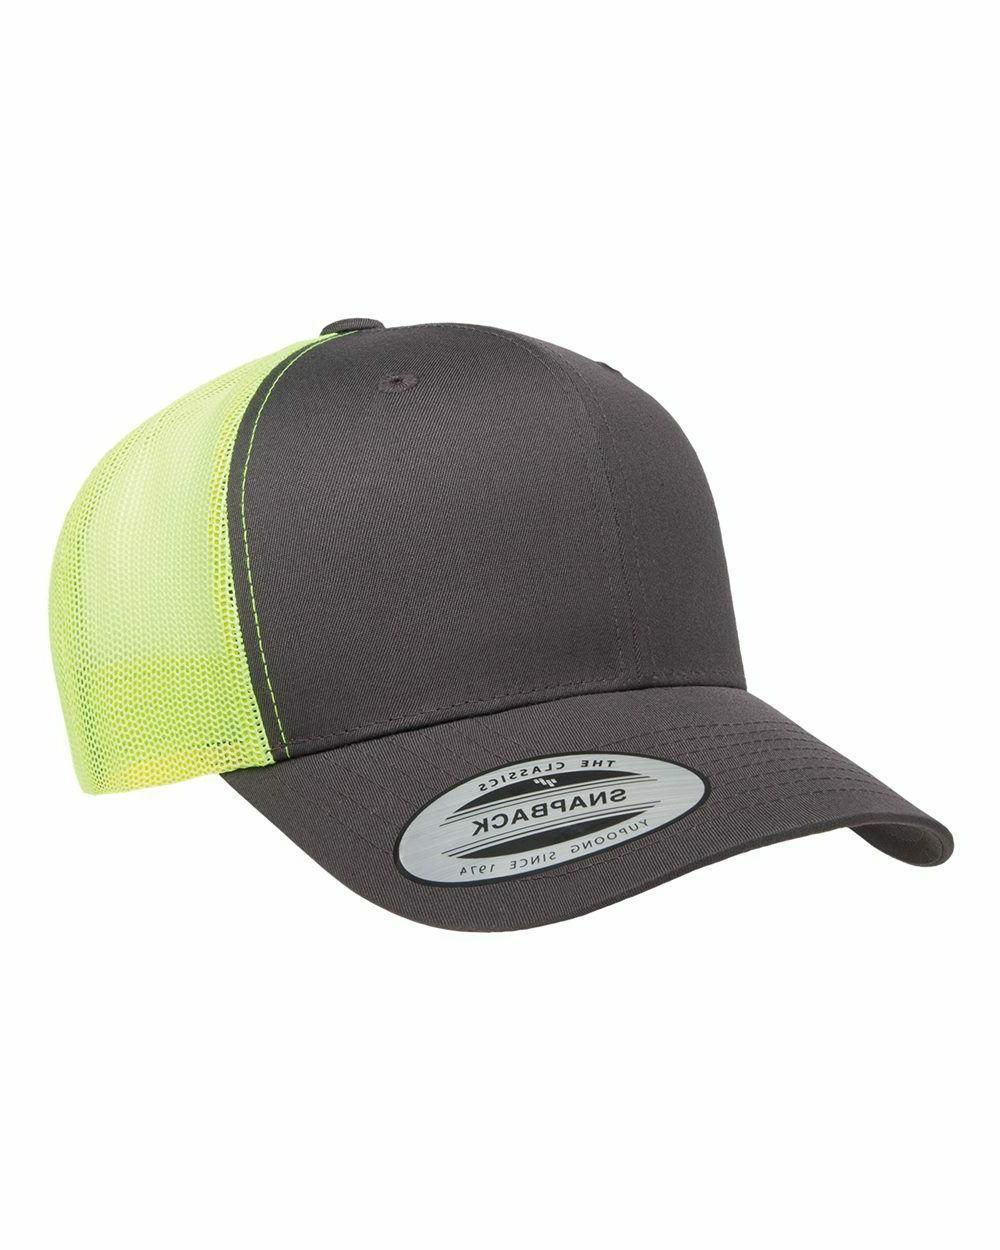 Yupoong Classic Blank Cotton Snapback Hat 6606MC & 6606T